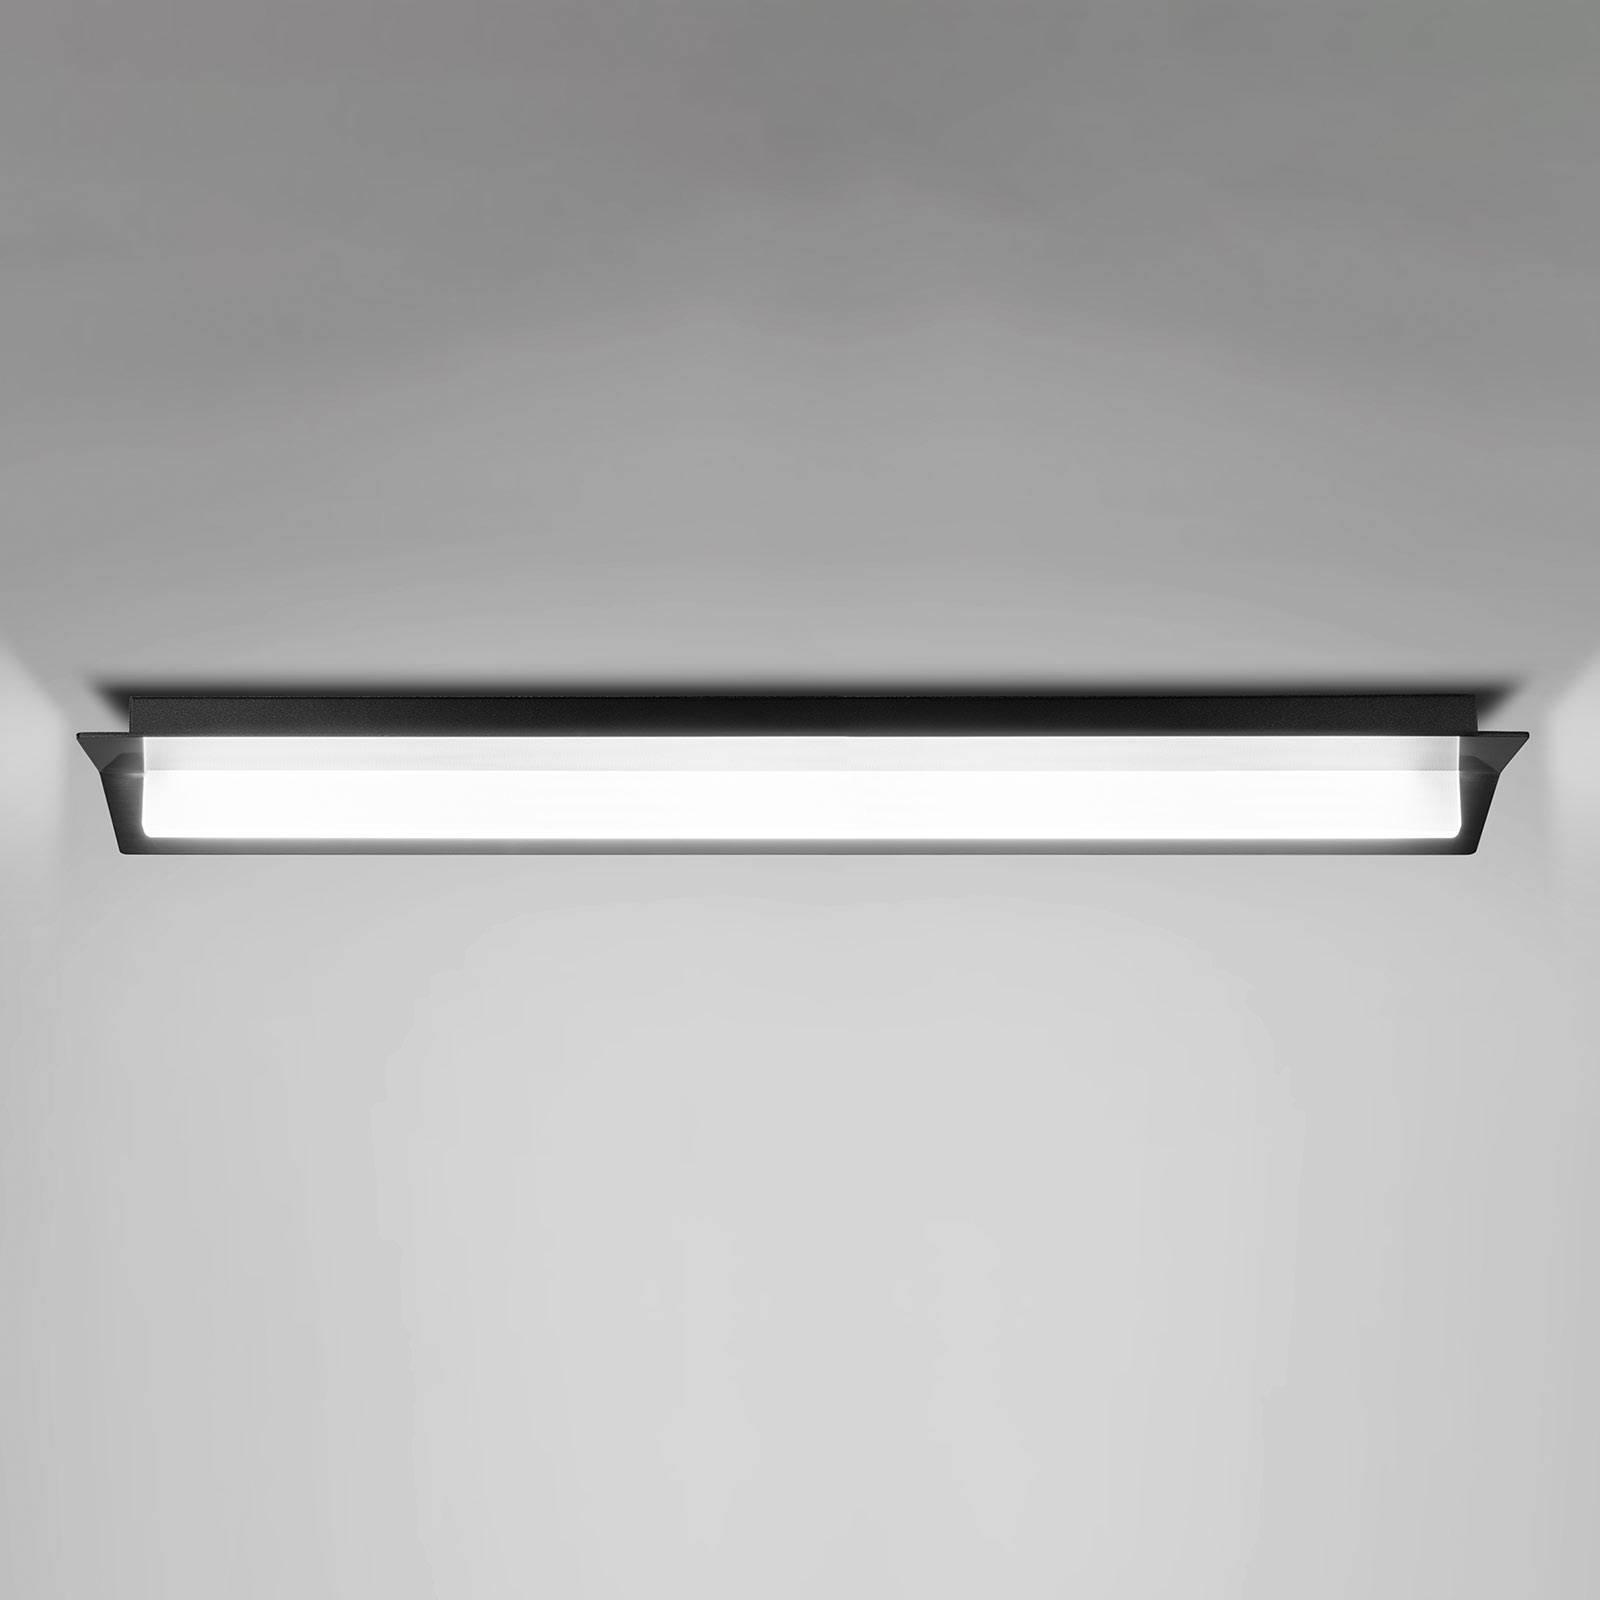 LED-kattovalaisin Flurry, 70 cm, musta